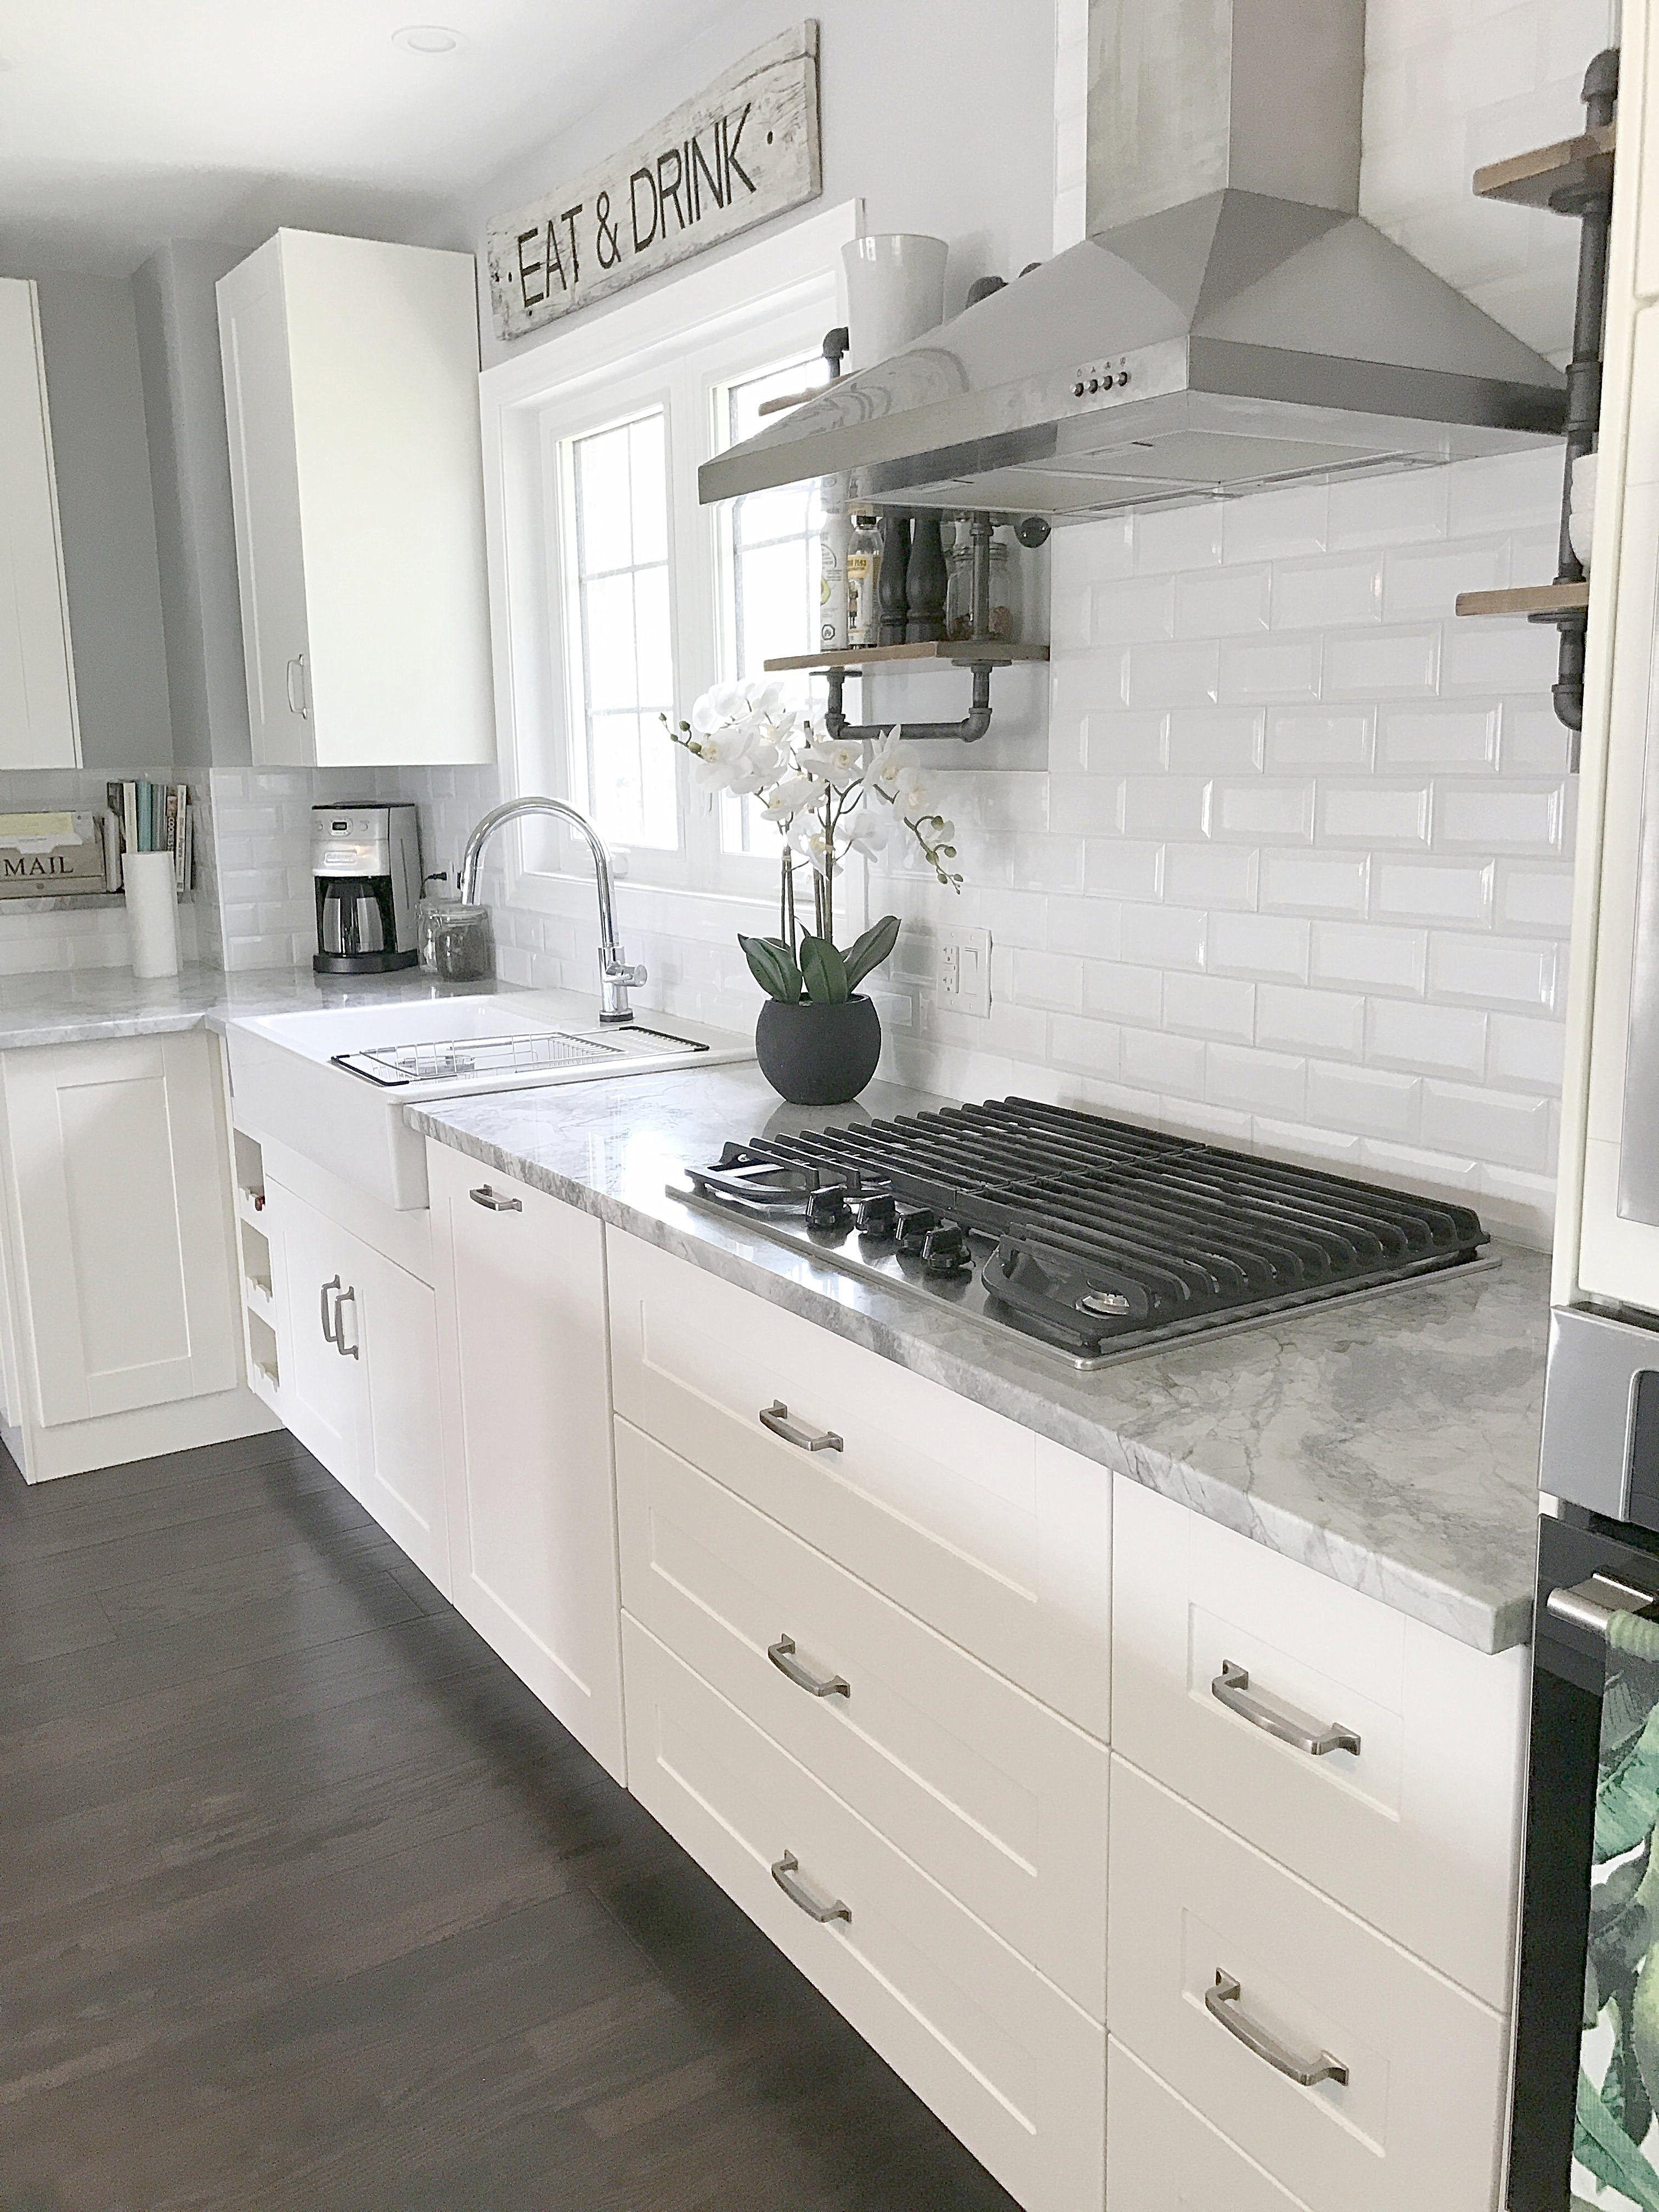 Ikea Kitchen White Grimslov Cheap Kitchen Remodel Diy Kitchen Renovation Kitchen Layout